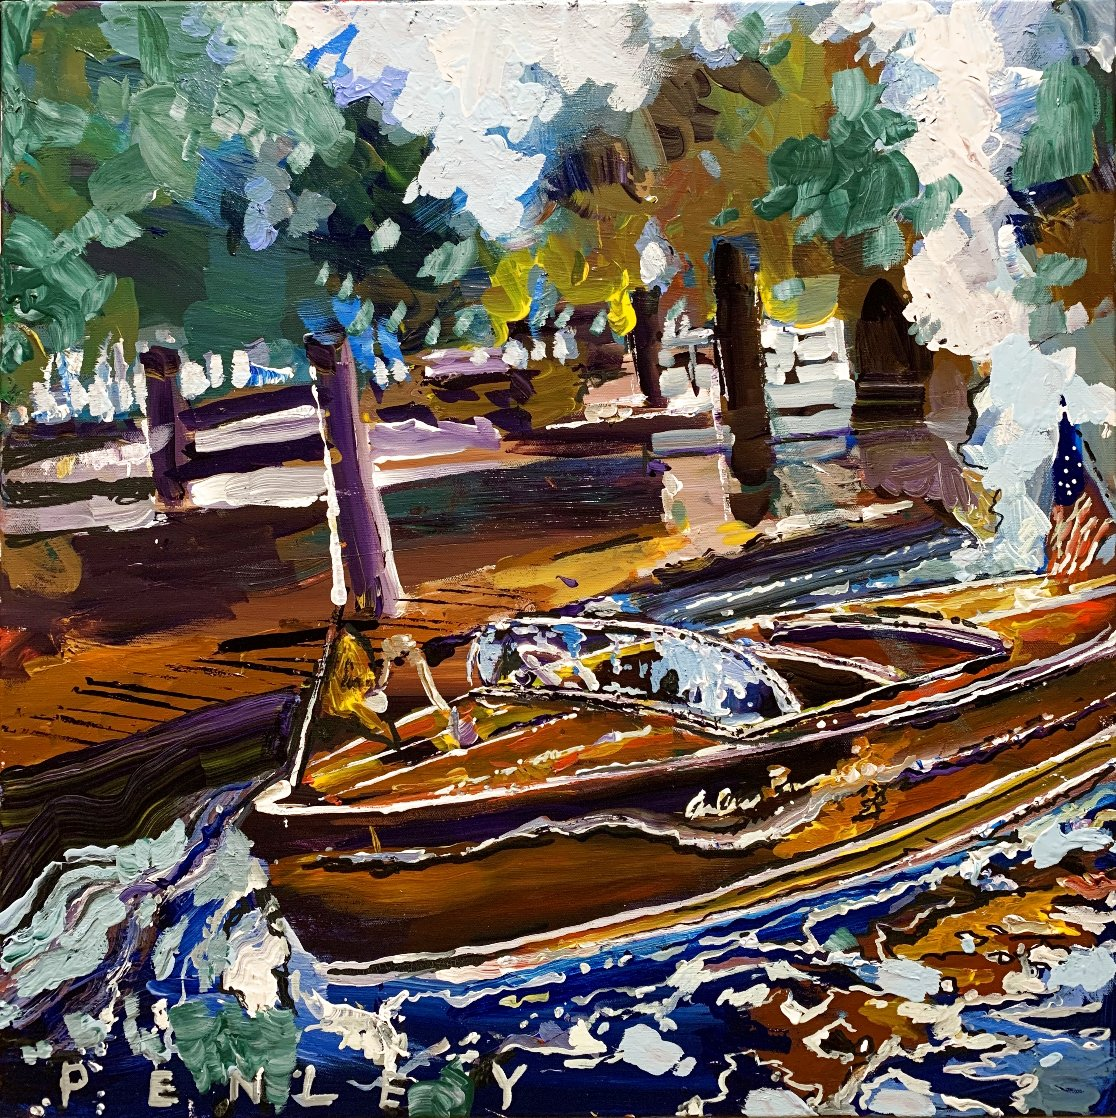 Vintage Boats 2020 24x24 Original Painting by Steve Penley